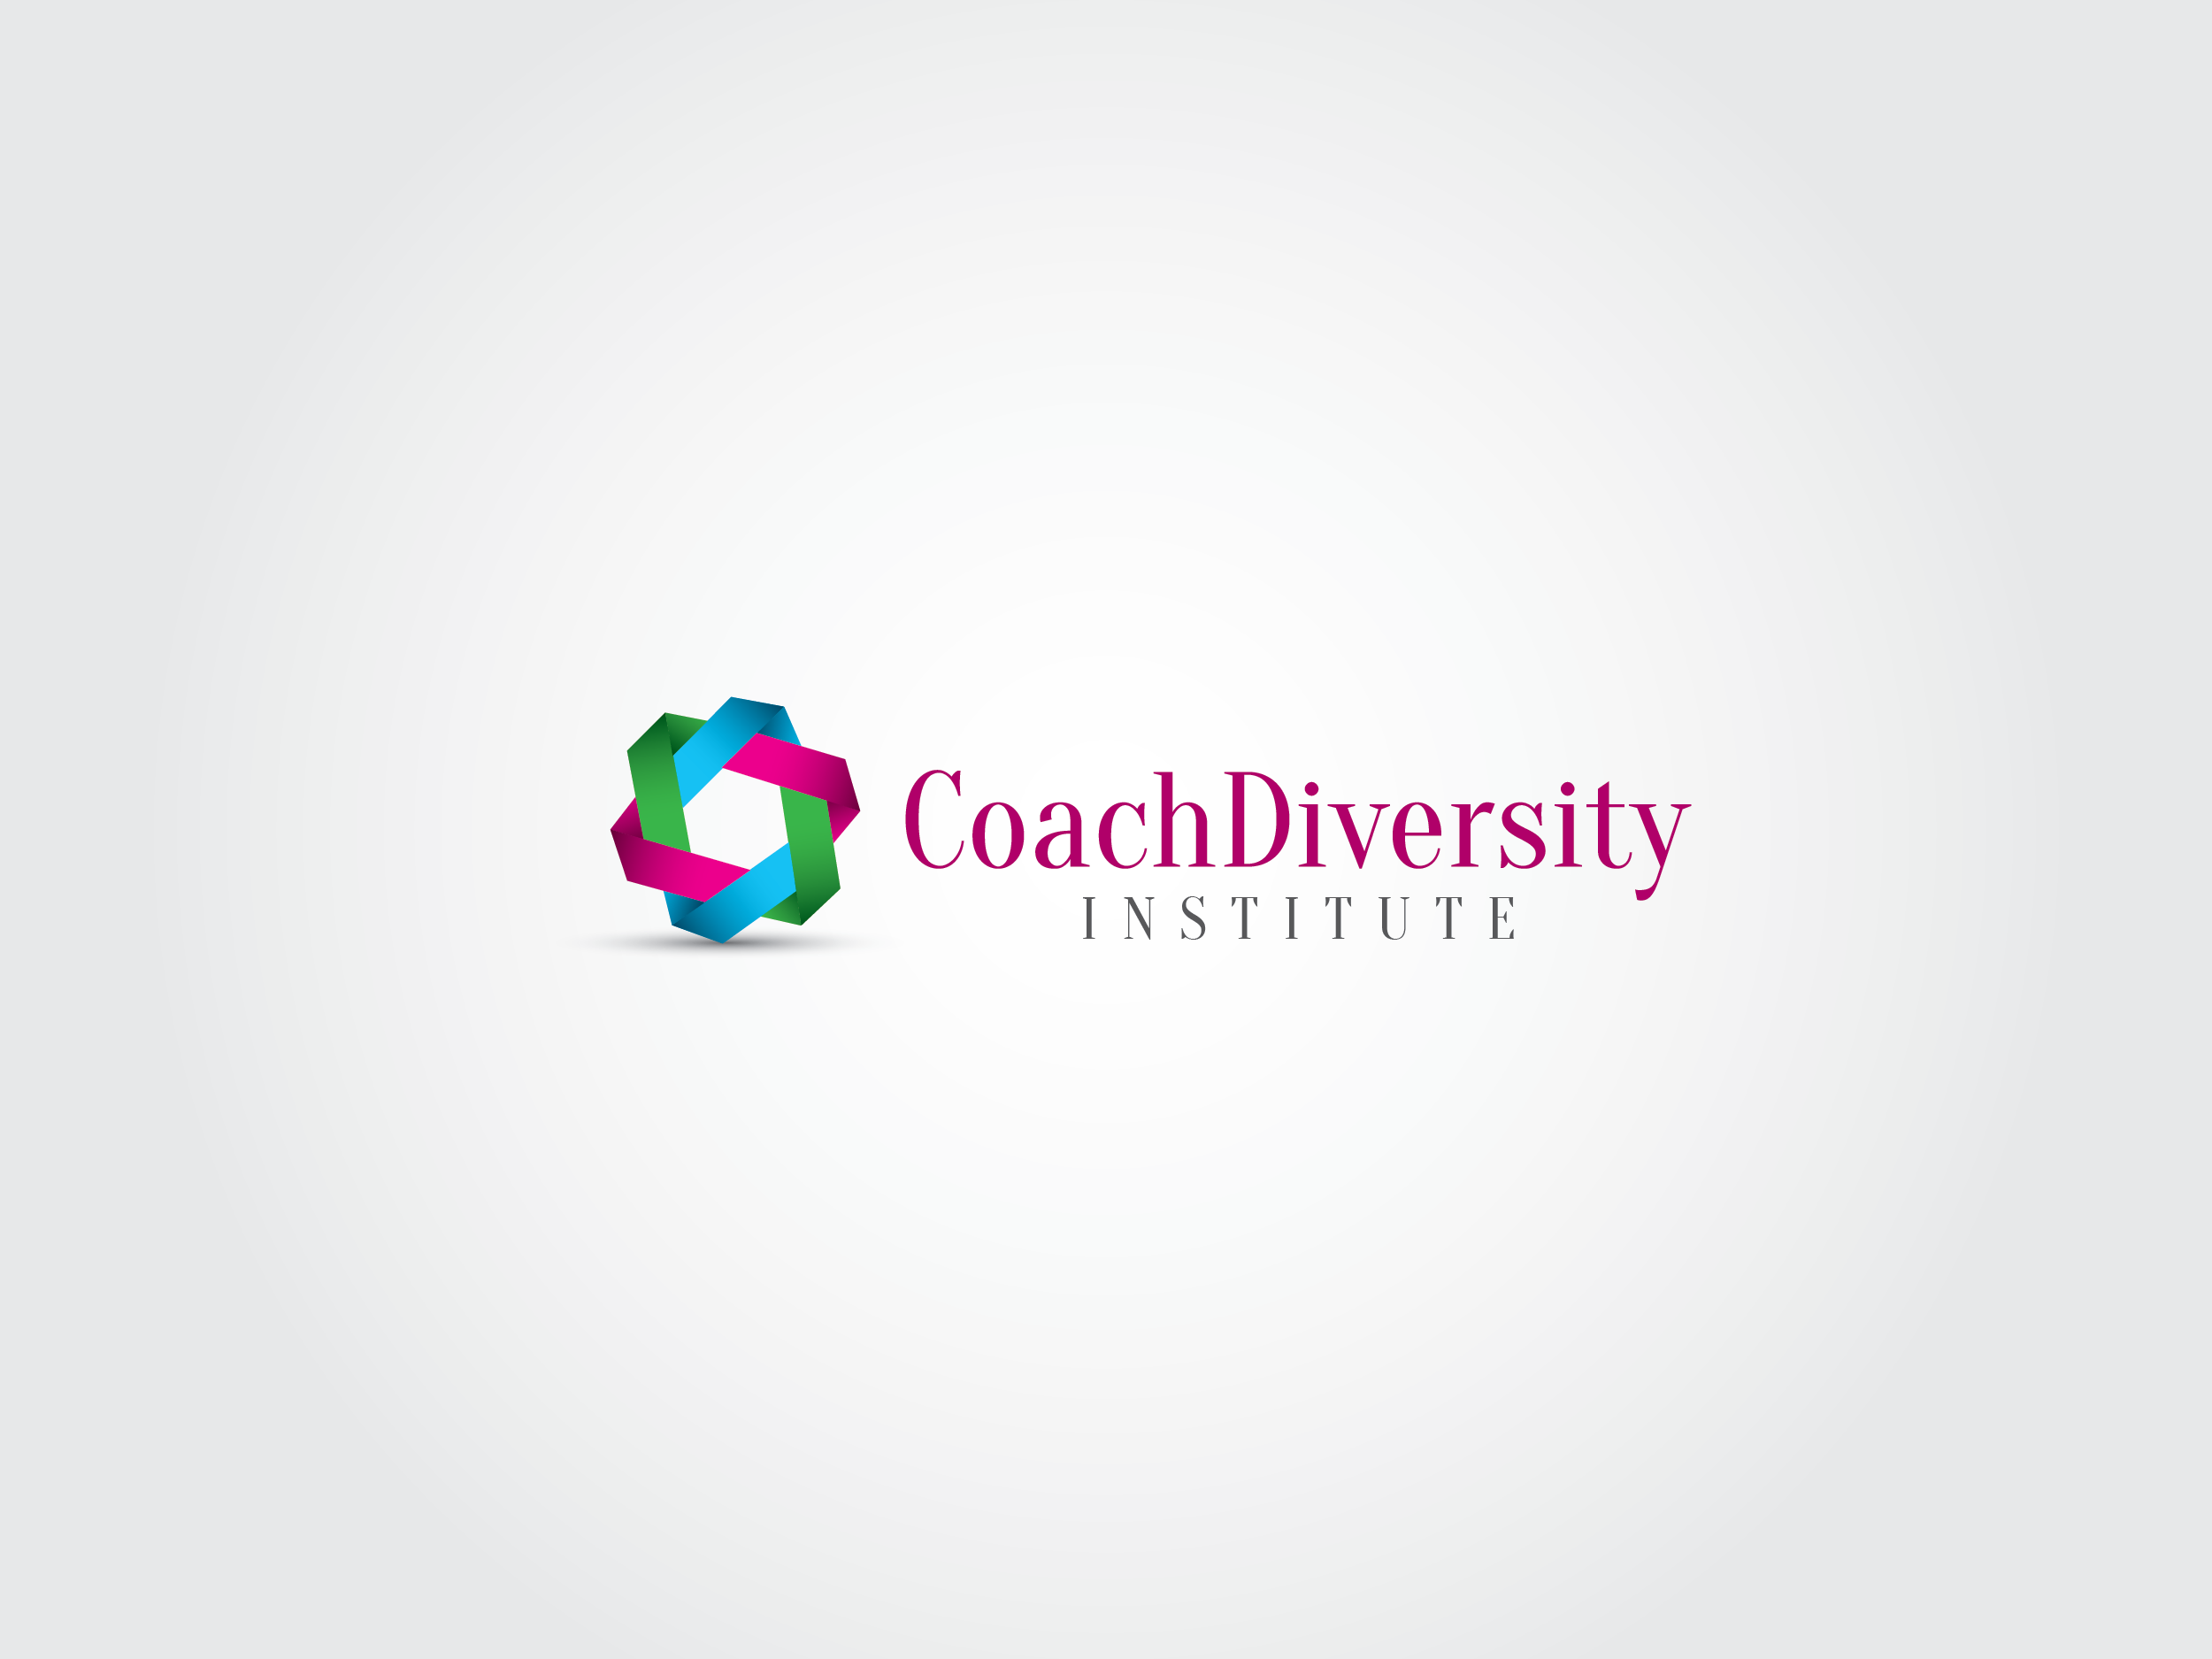 logo design contests 187 coachdiversity institute logo